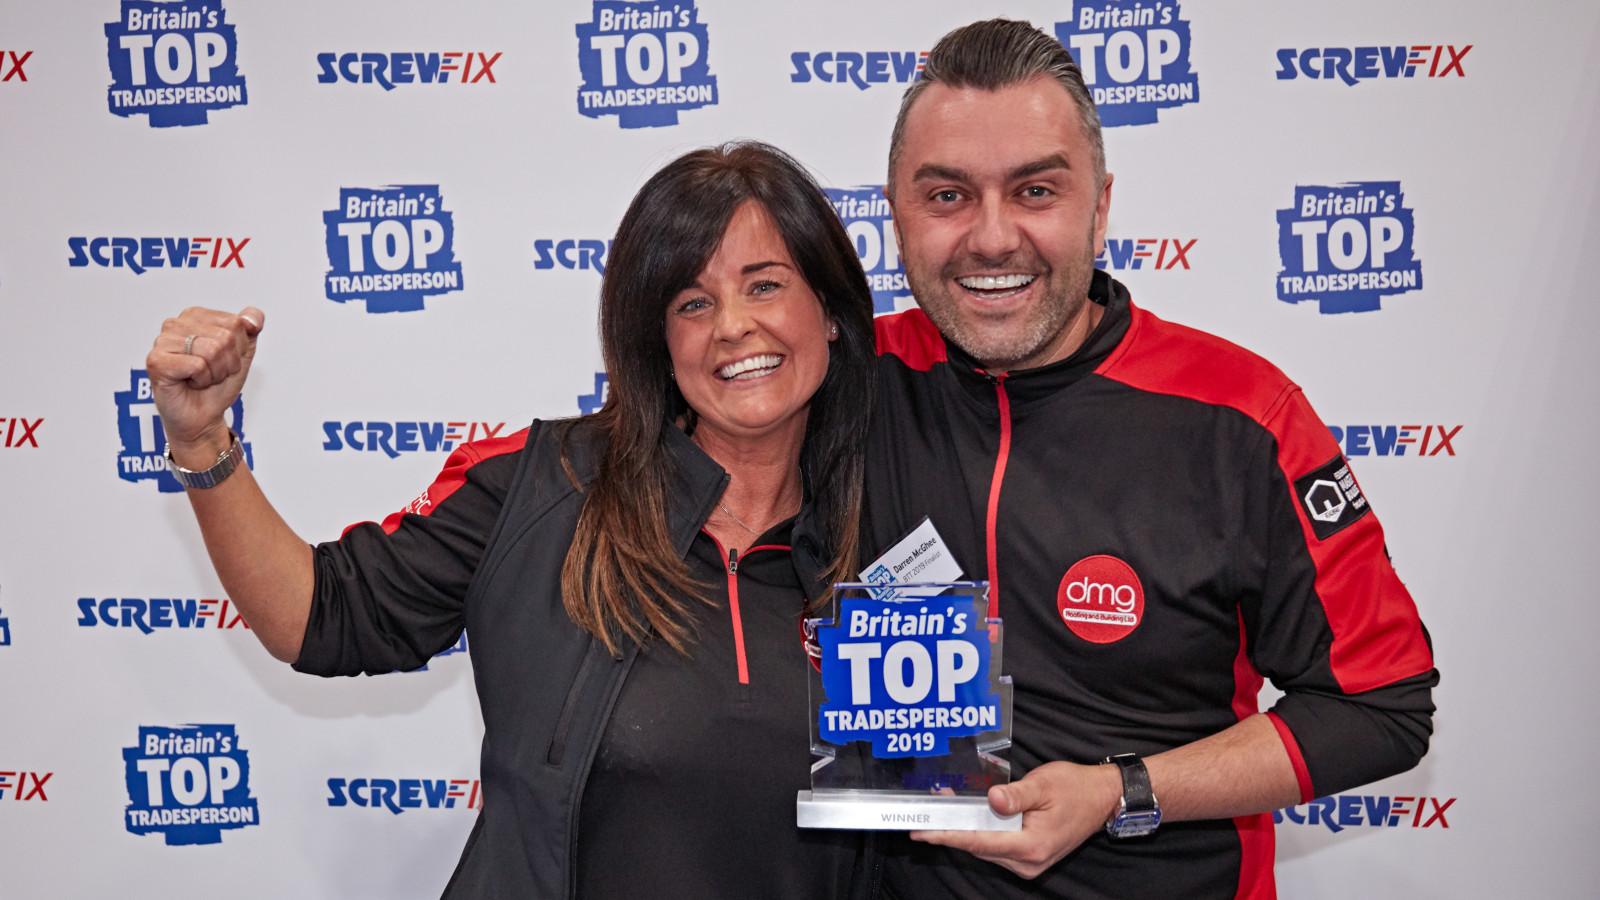 MEET Screwfix's Britain's Top Tradesperson 2019 – third generation roofer Darren McGhee